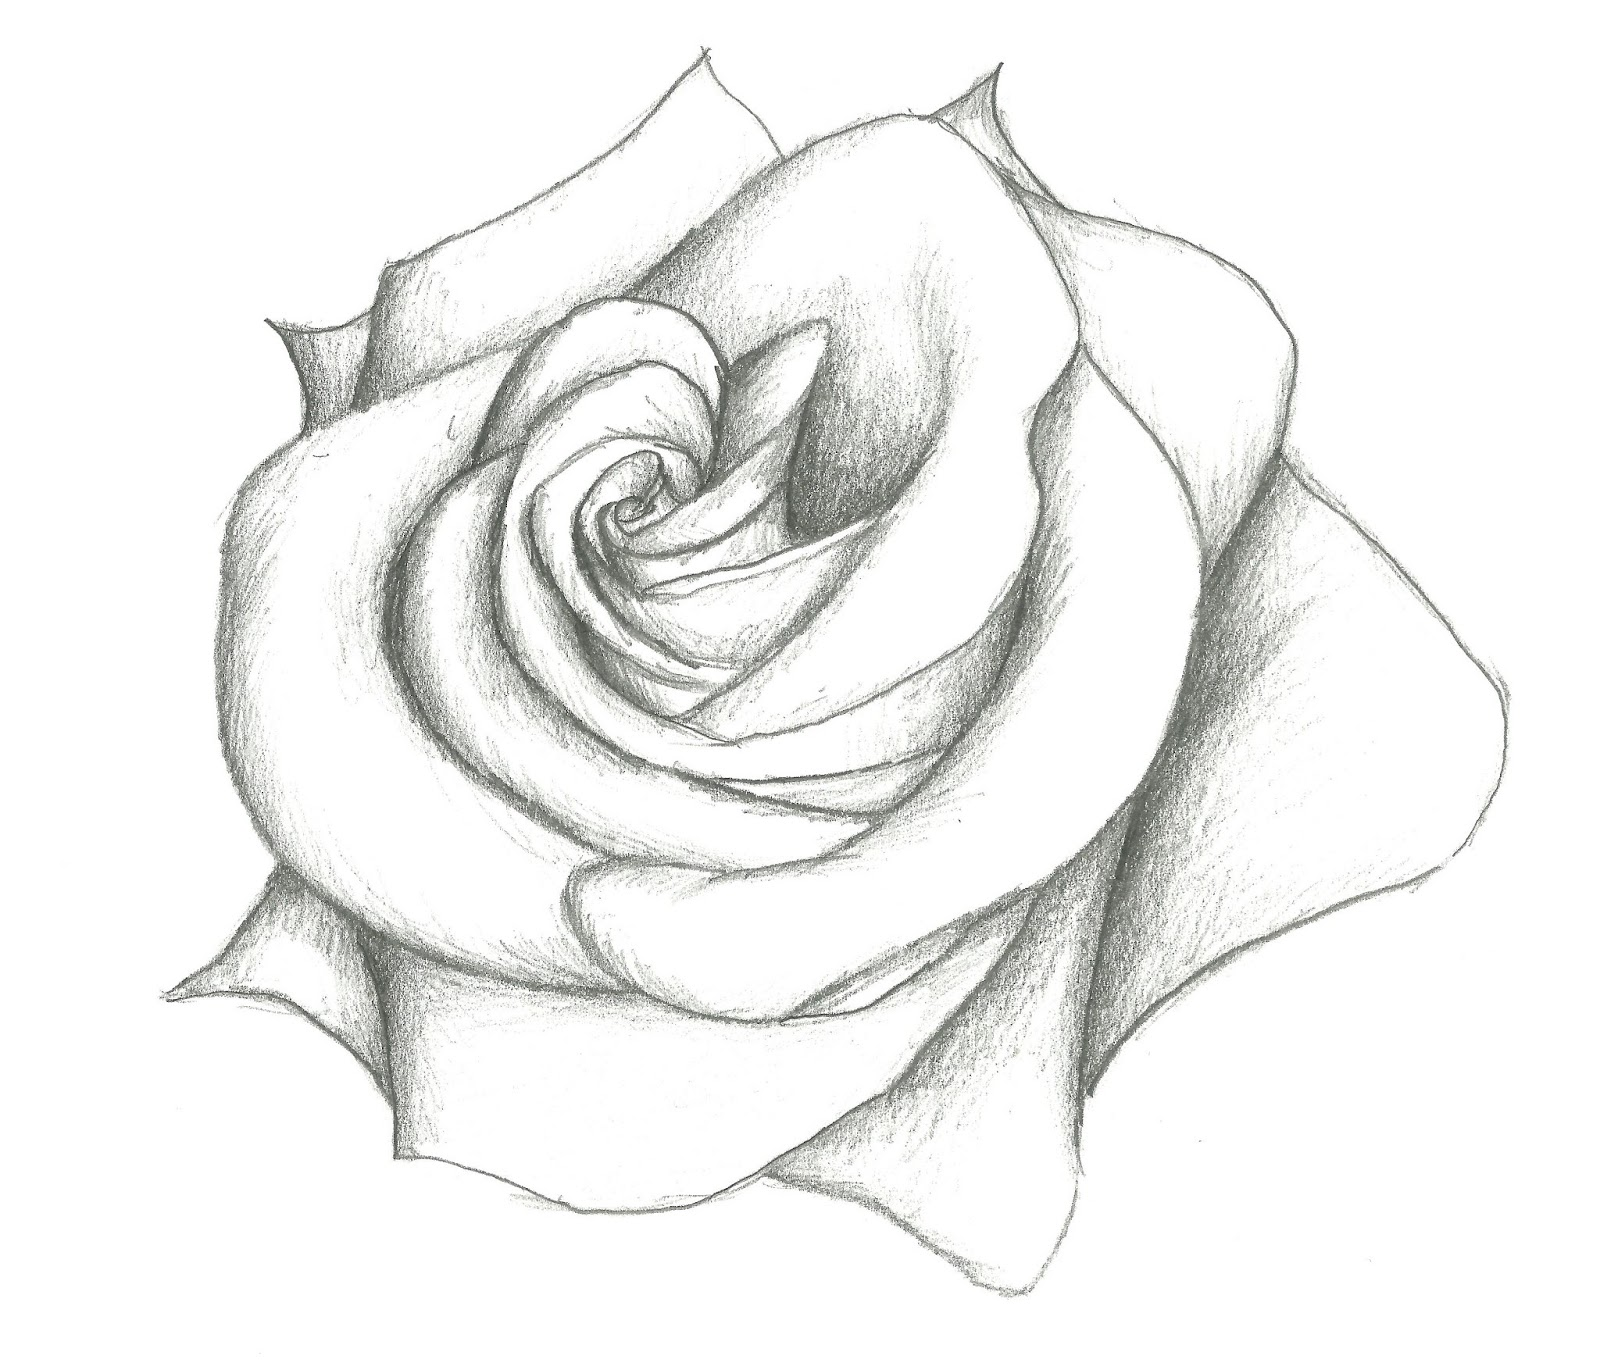 Drawn rose pencil for kid Flower tumblr flower drawing Google